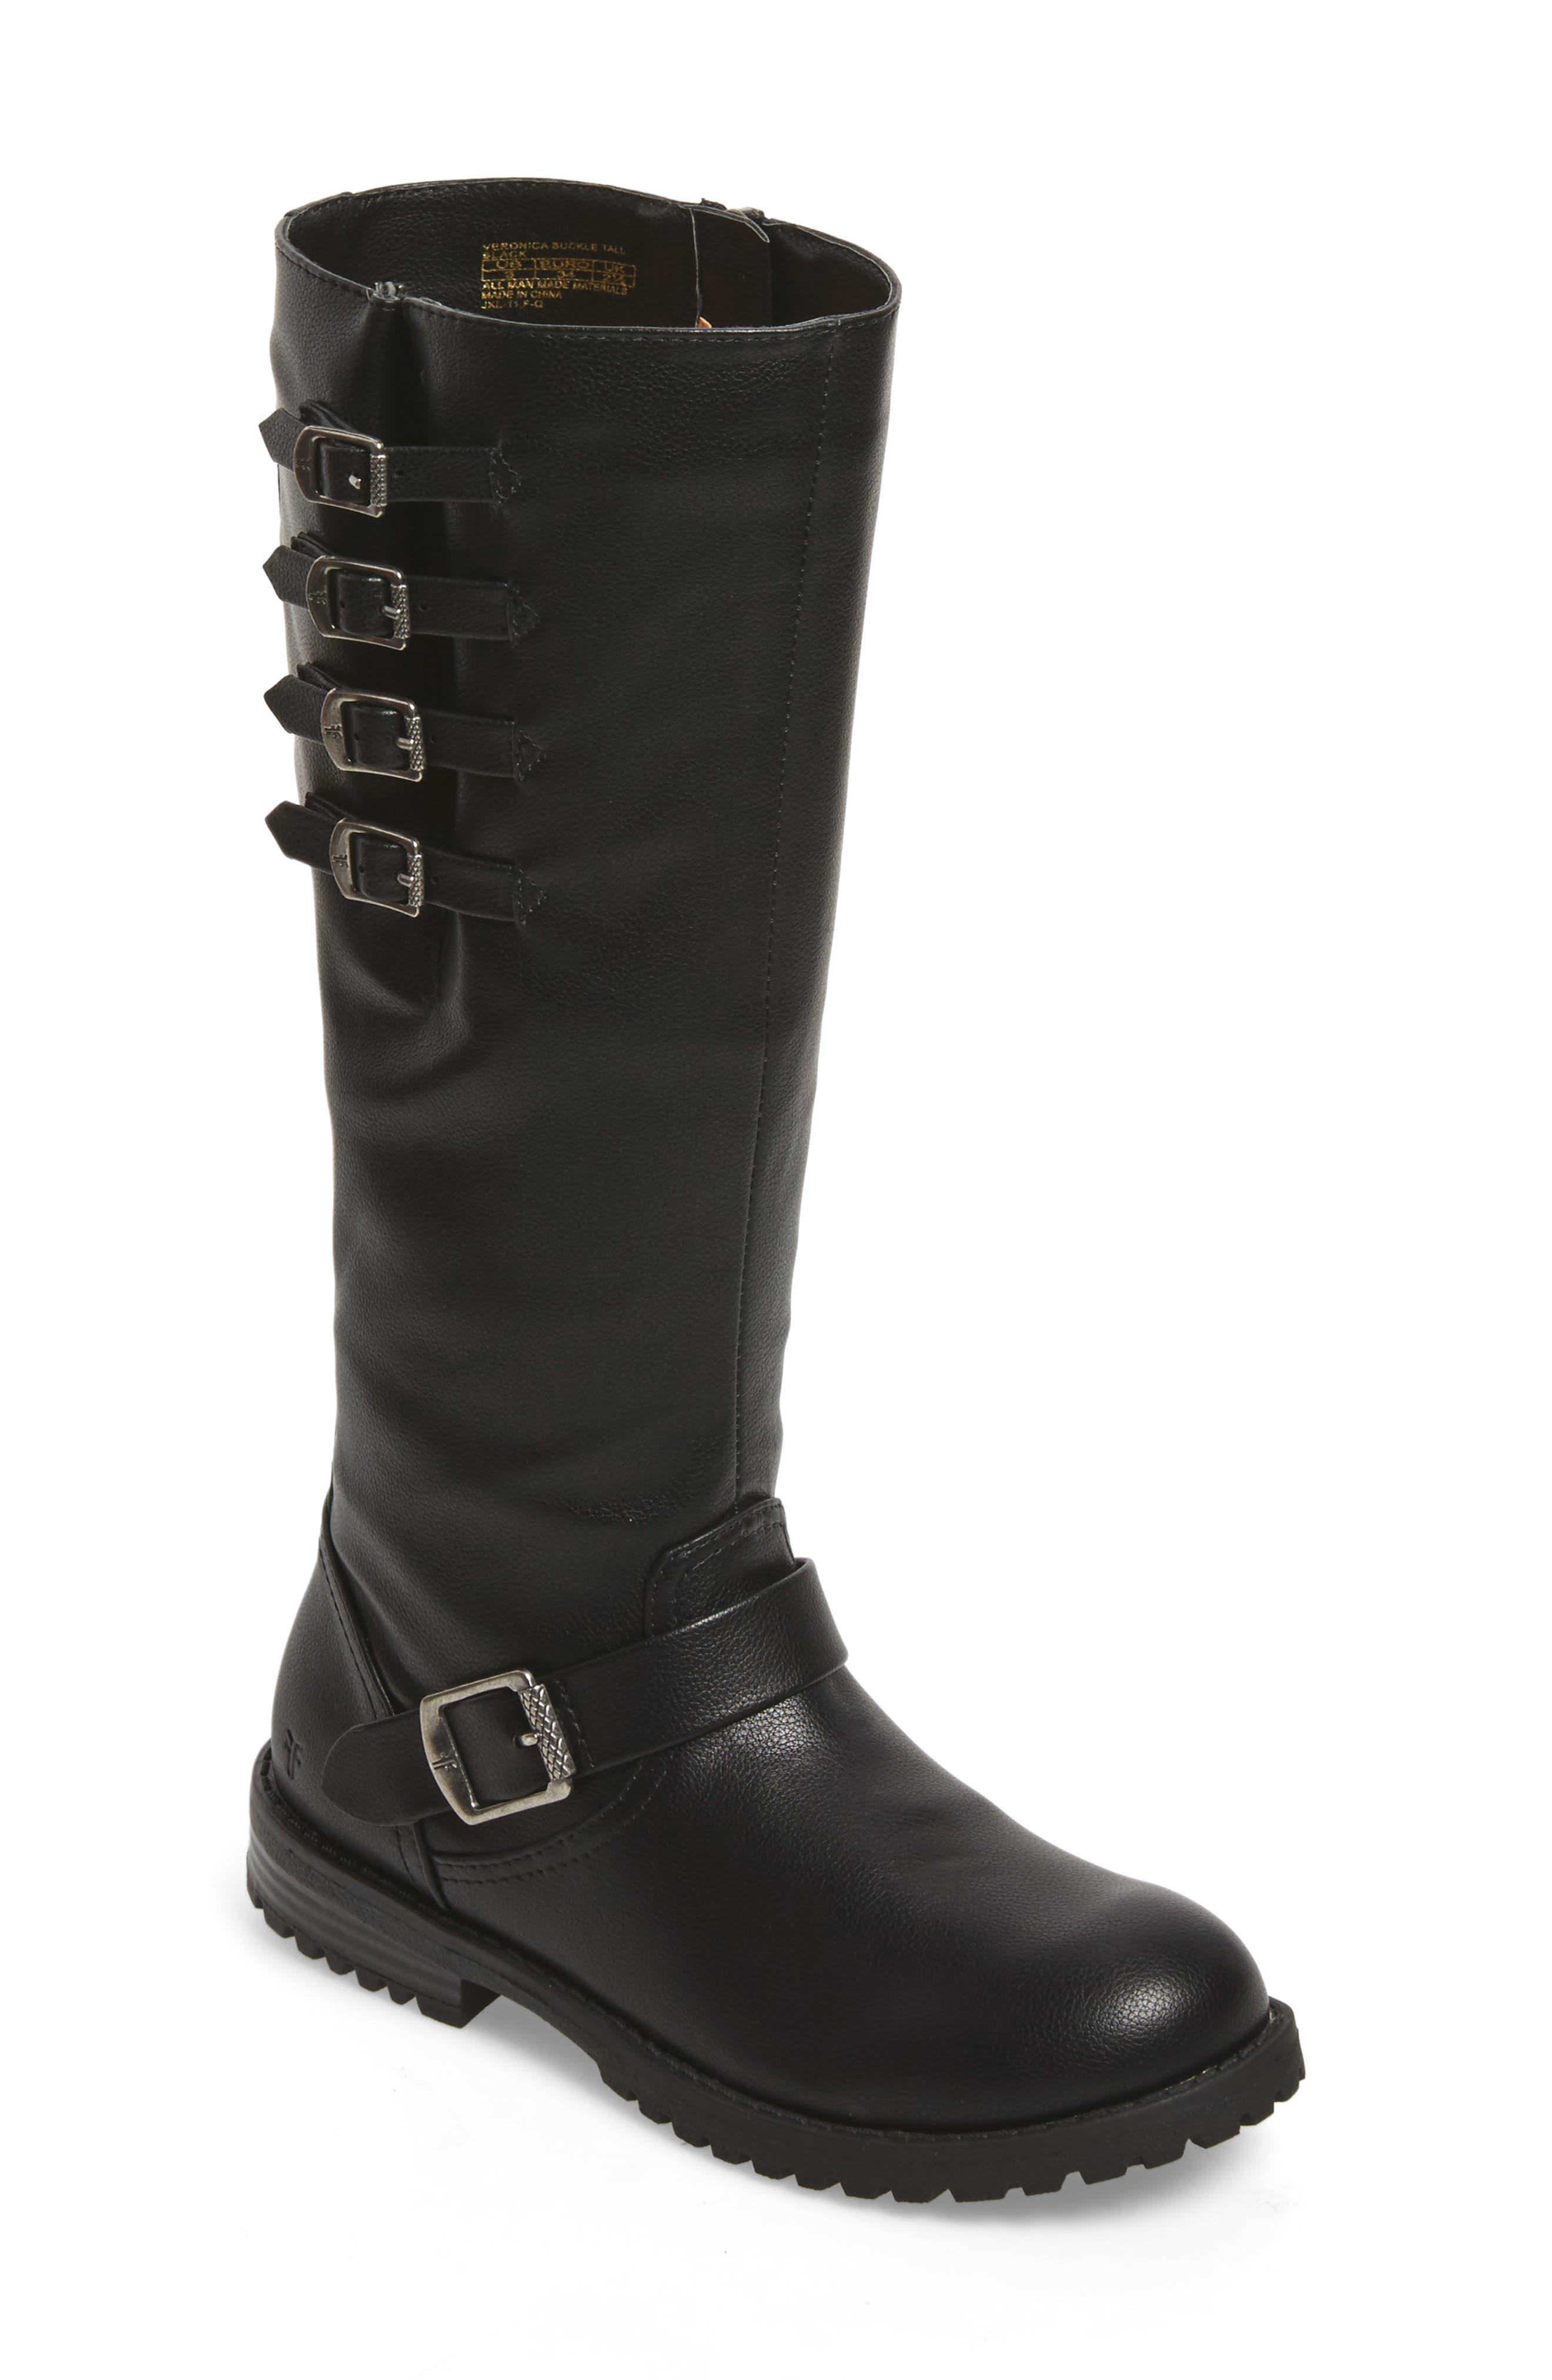 Veronica Tall Buckle Strap Boot,                             Main thumbnail 1, color,                             BLACK